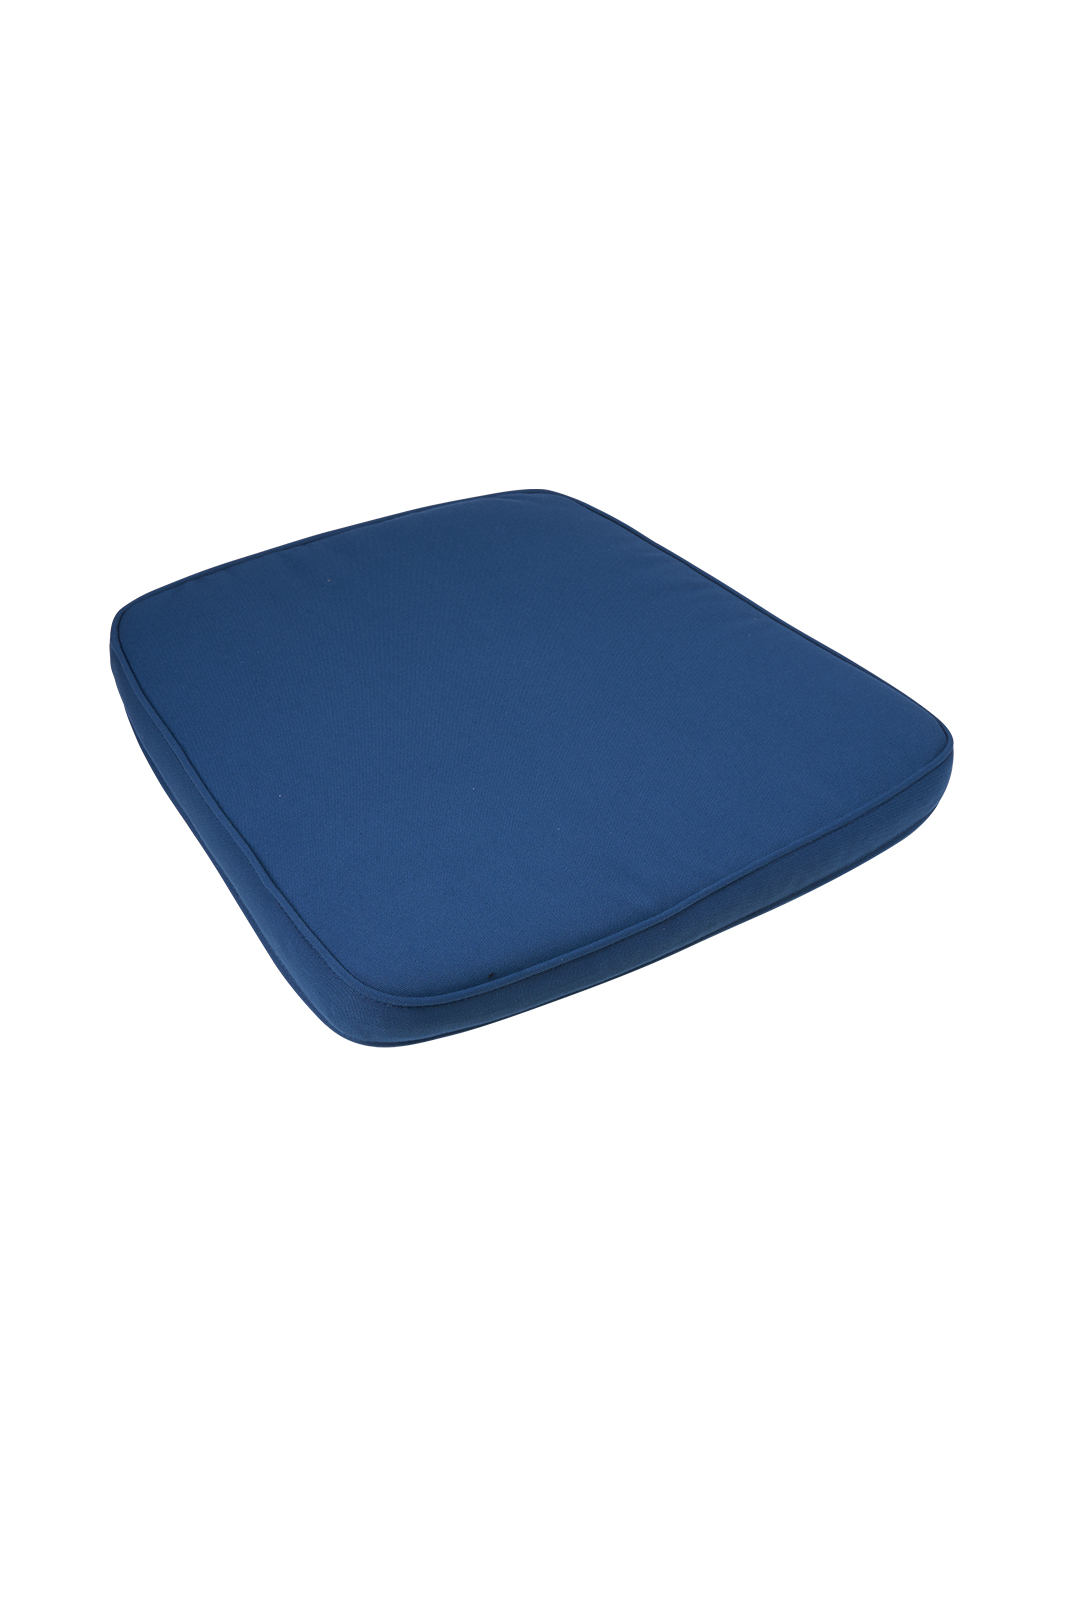 Blau Kissen Lloyd loom